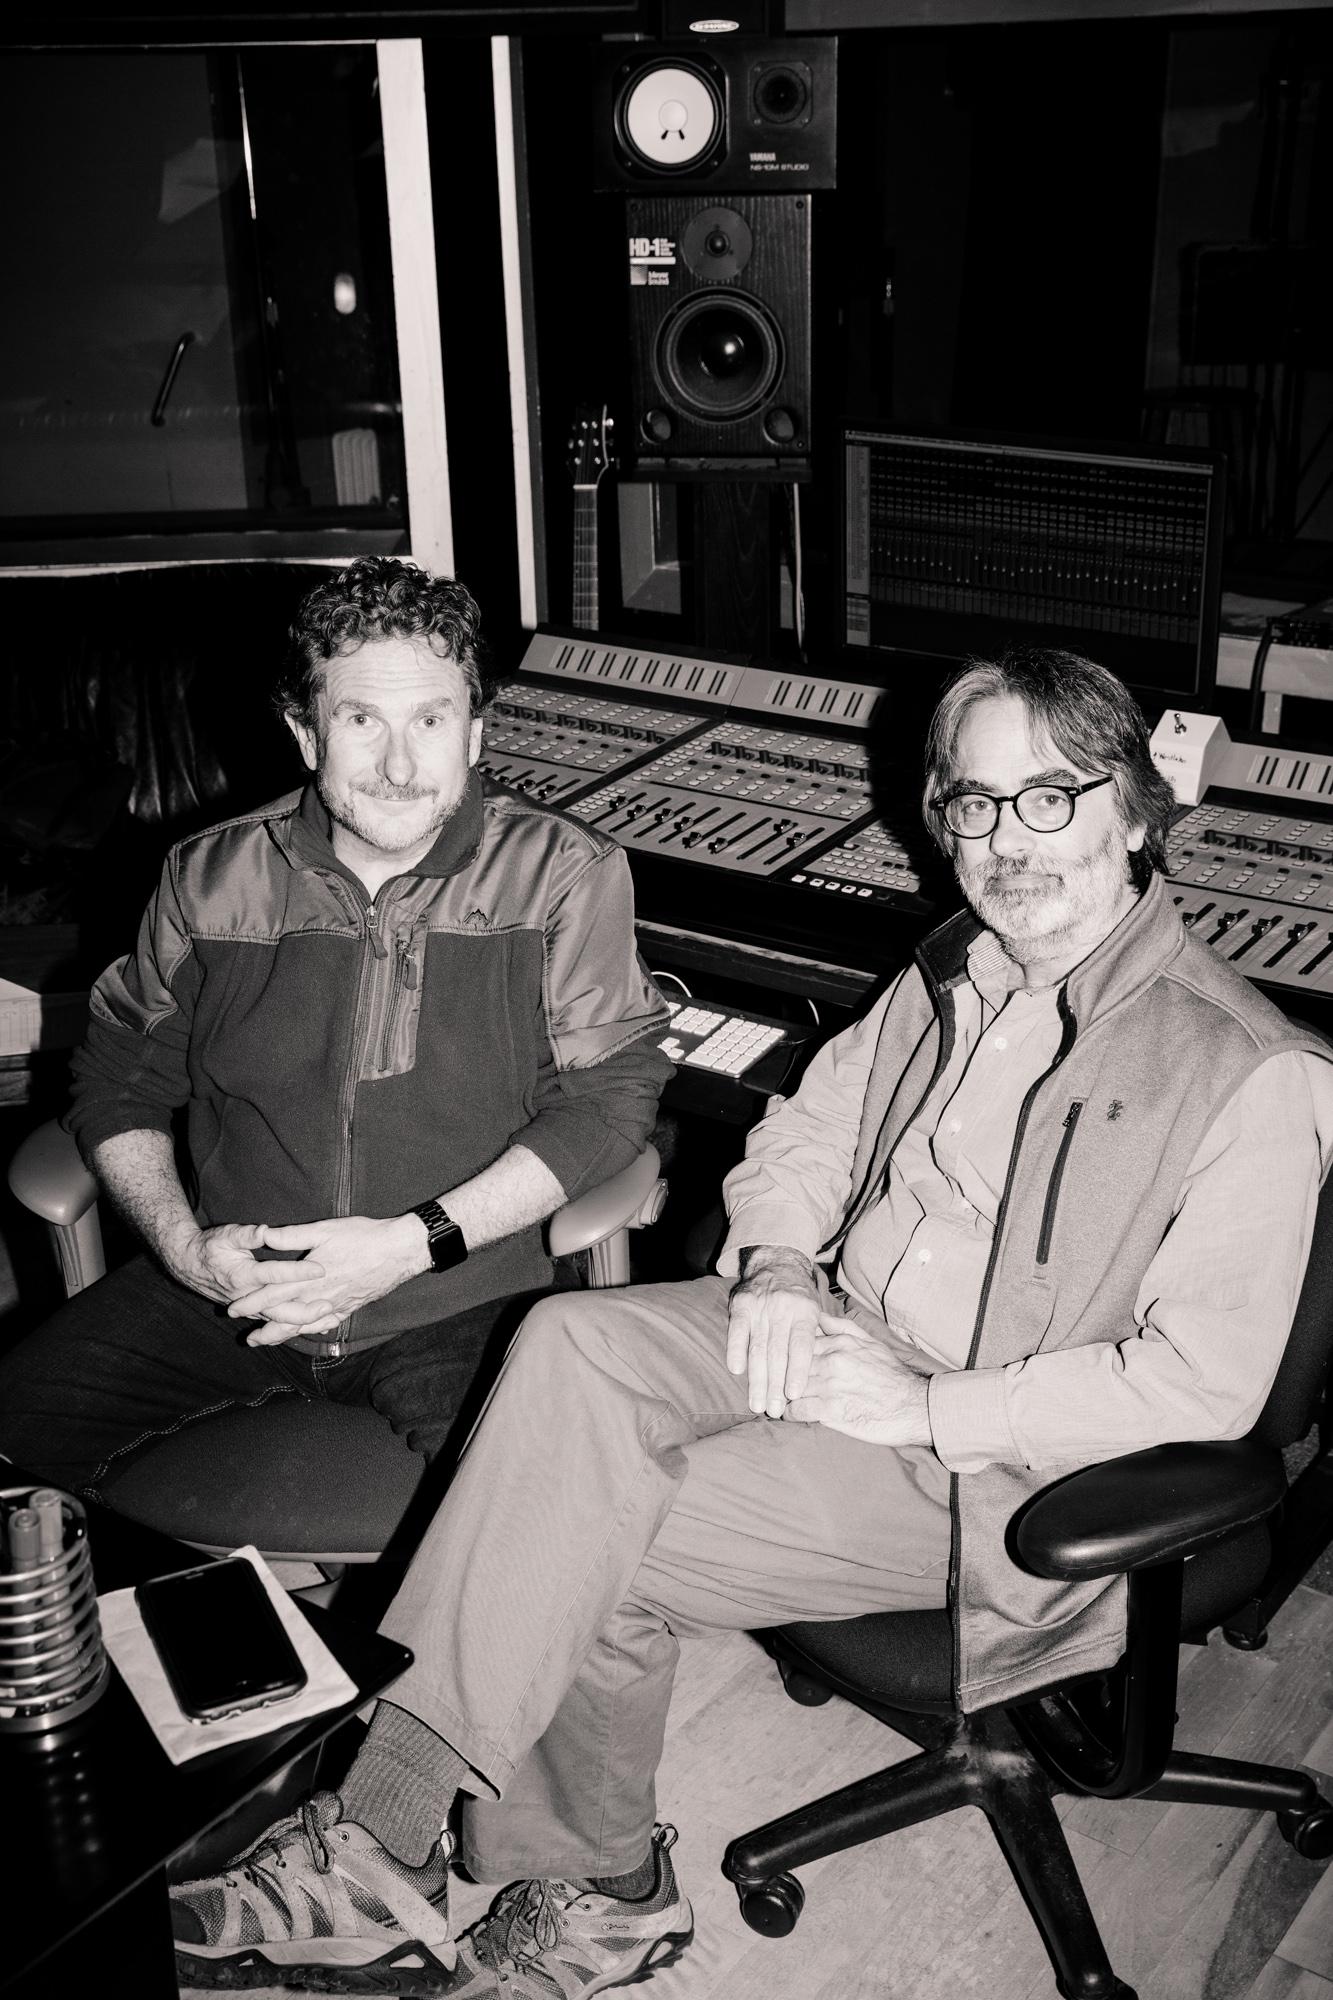 Michael Farquharson & Matthew Nicholl